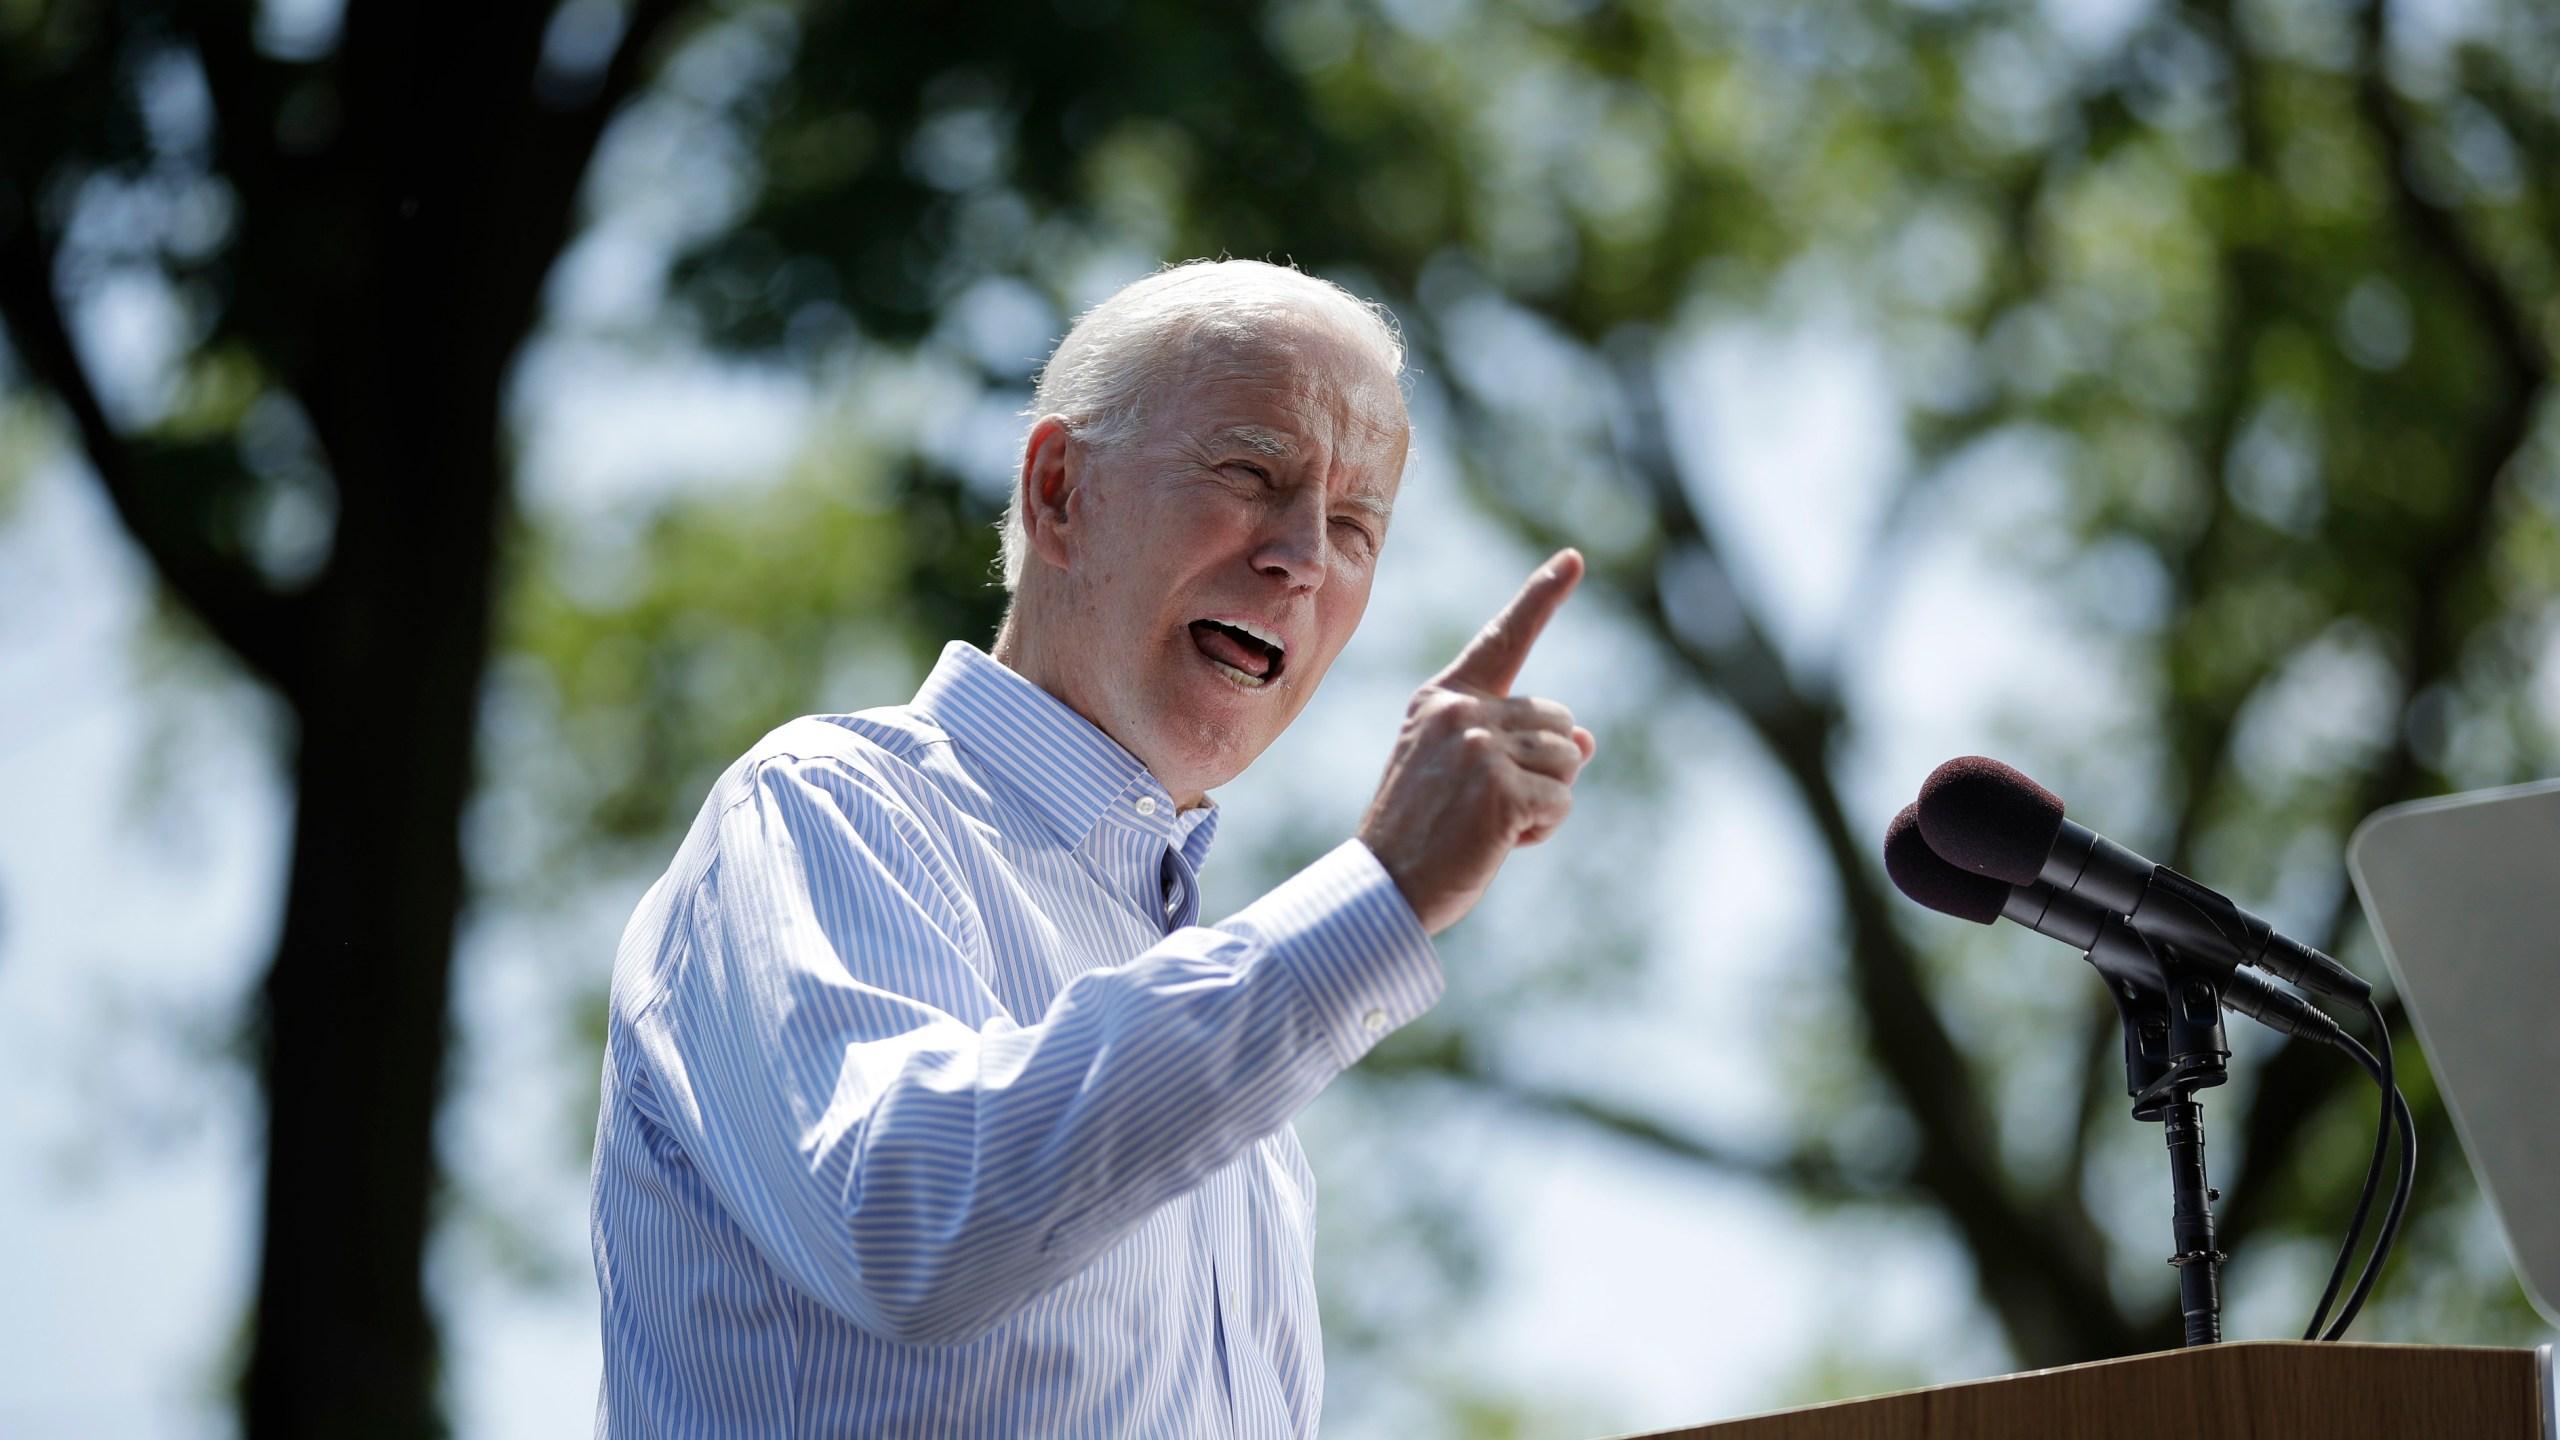 Election_2020_Joe_Biden_31024-159532.jpg54264431